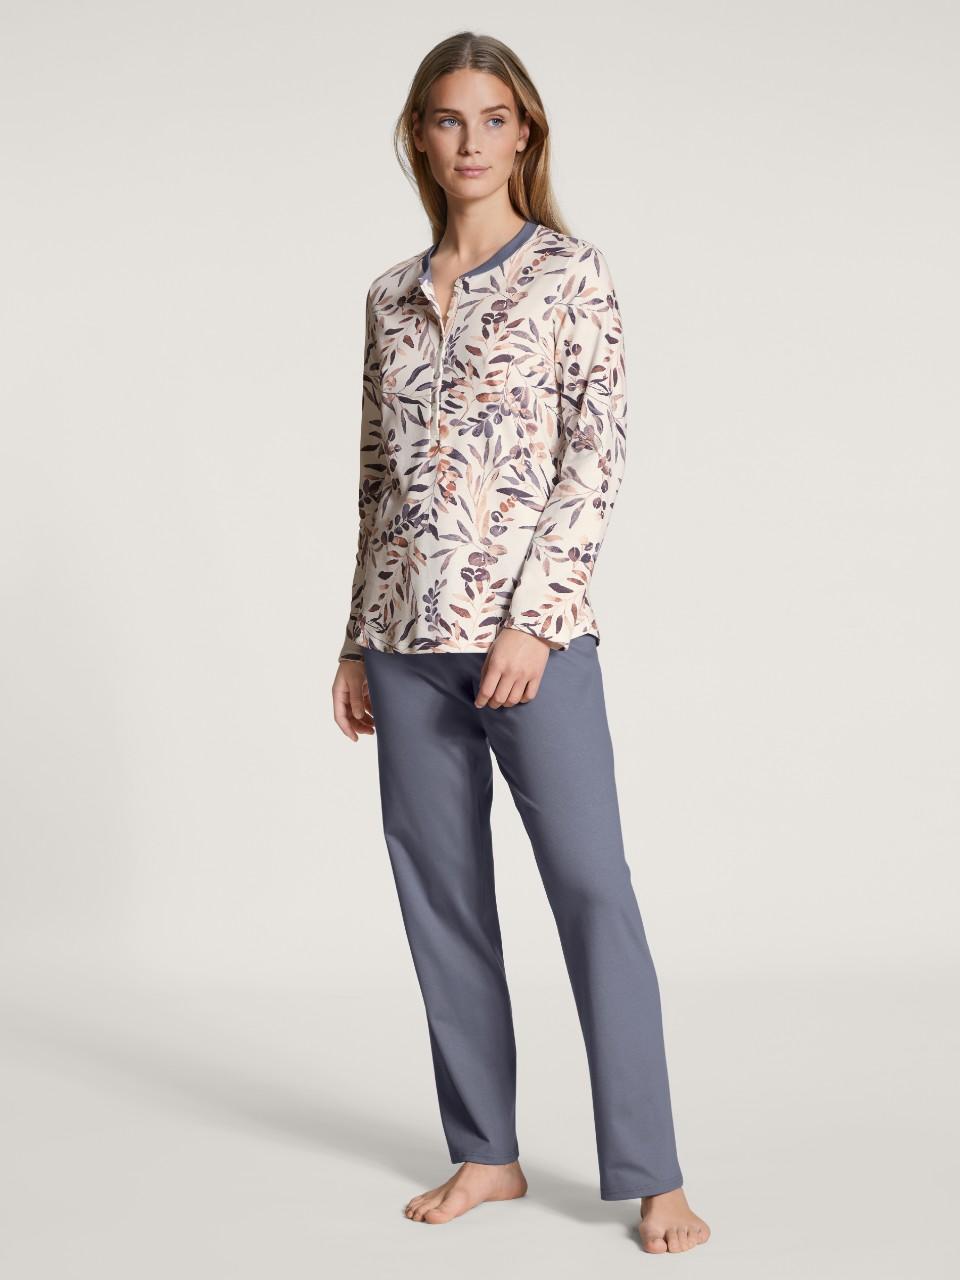 Calida pyjamas Midnight Flower 46624 / 316